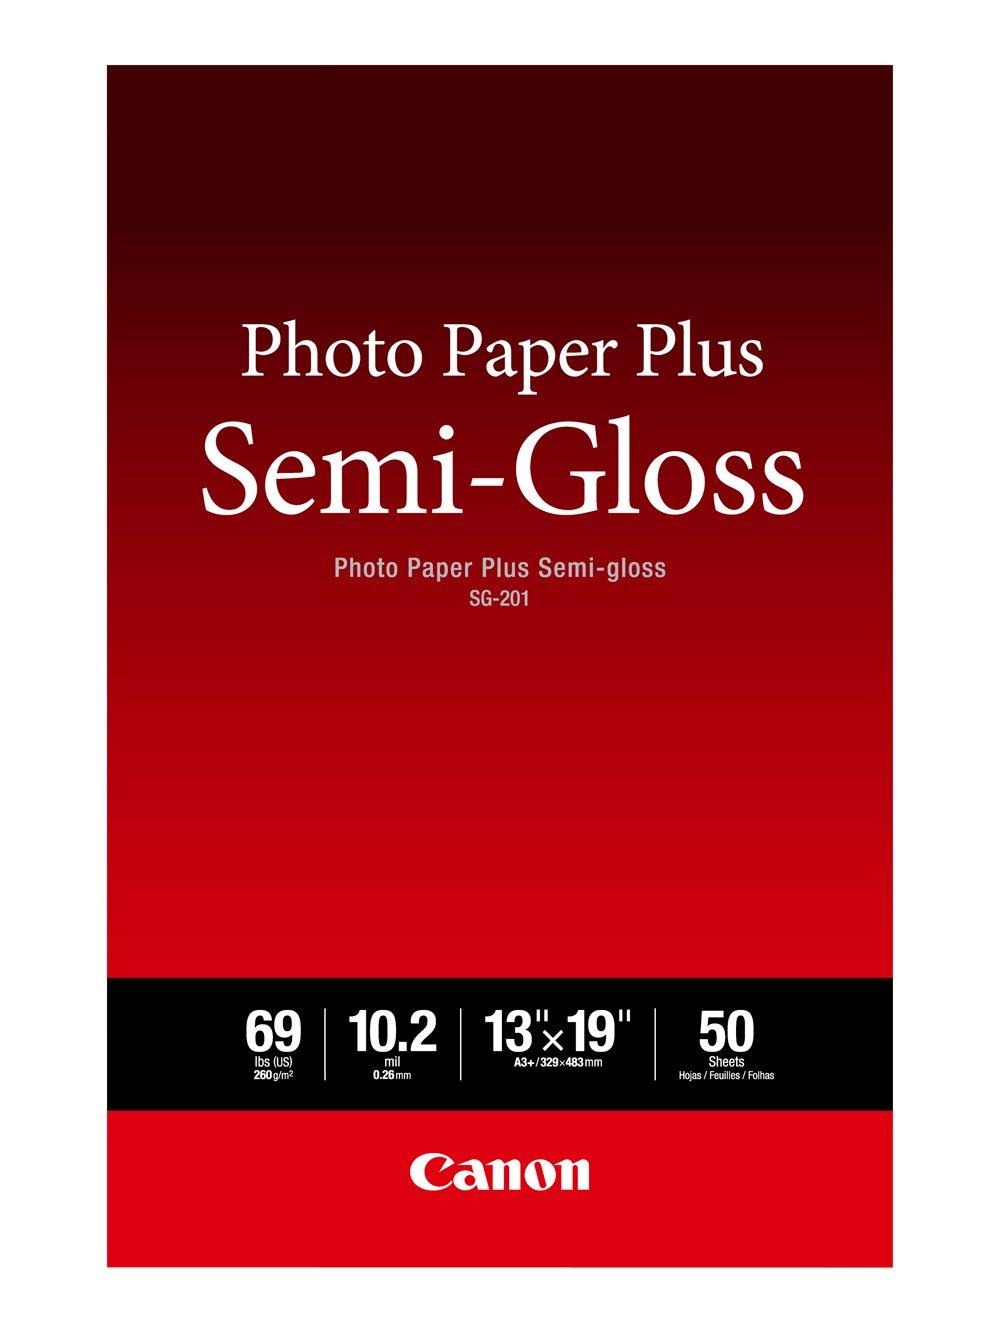 Canon SG-201 13X19(50)  Photo Paper Plus Semi-Gloss 13'' x 19'' (50 Sheets) (SG-201 13X19) by Canon (Image #1)